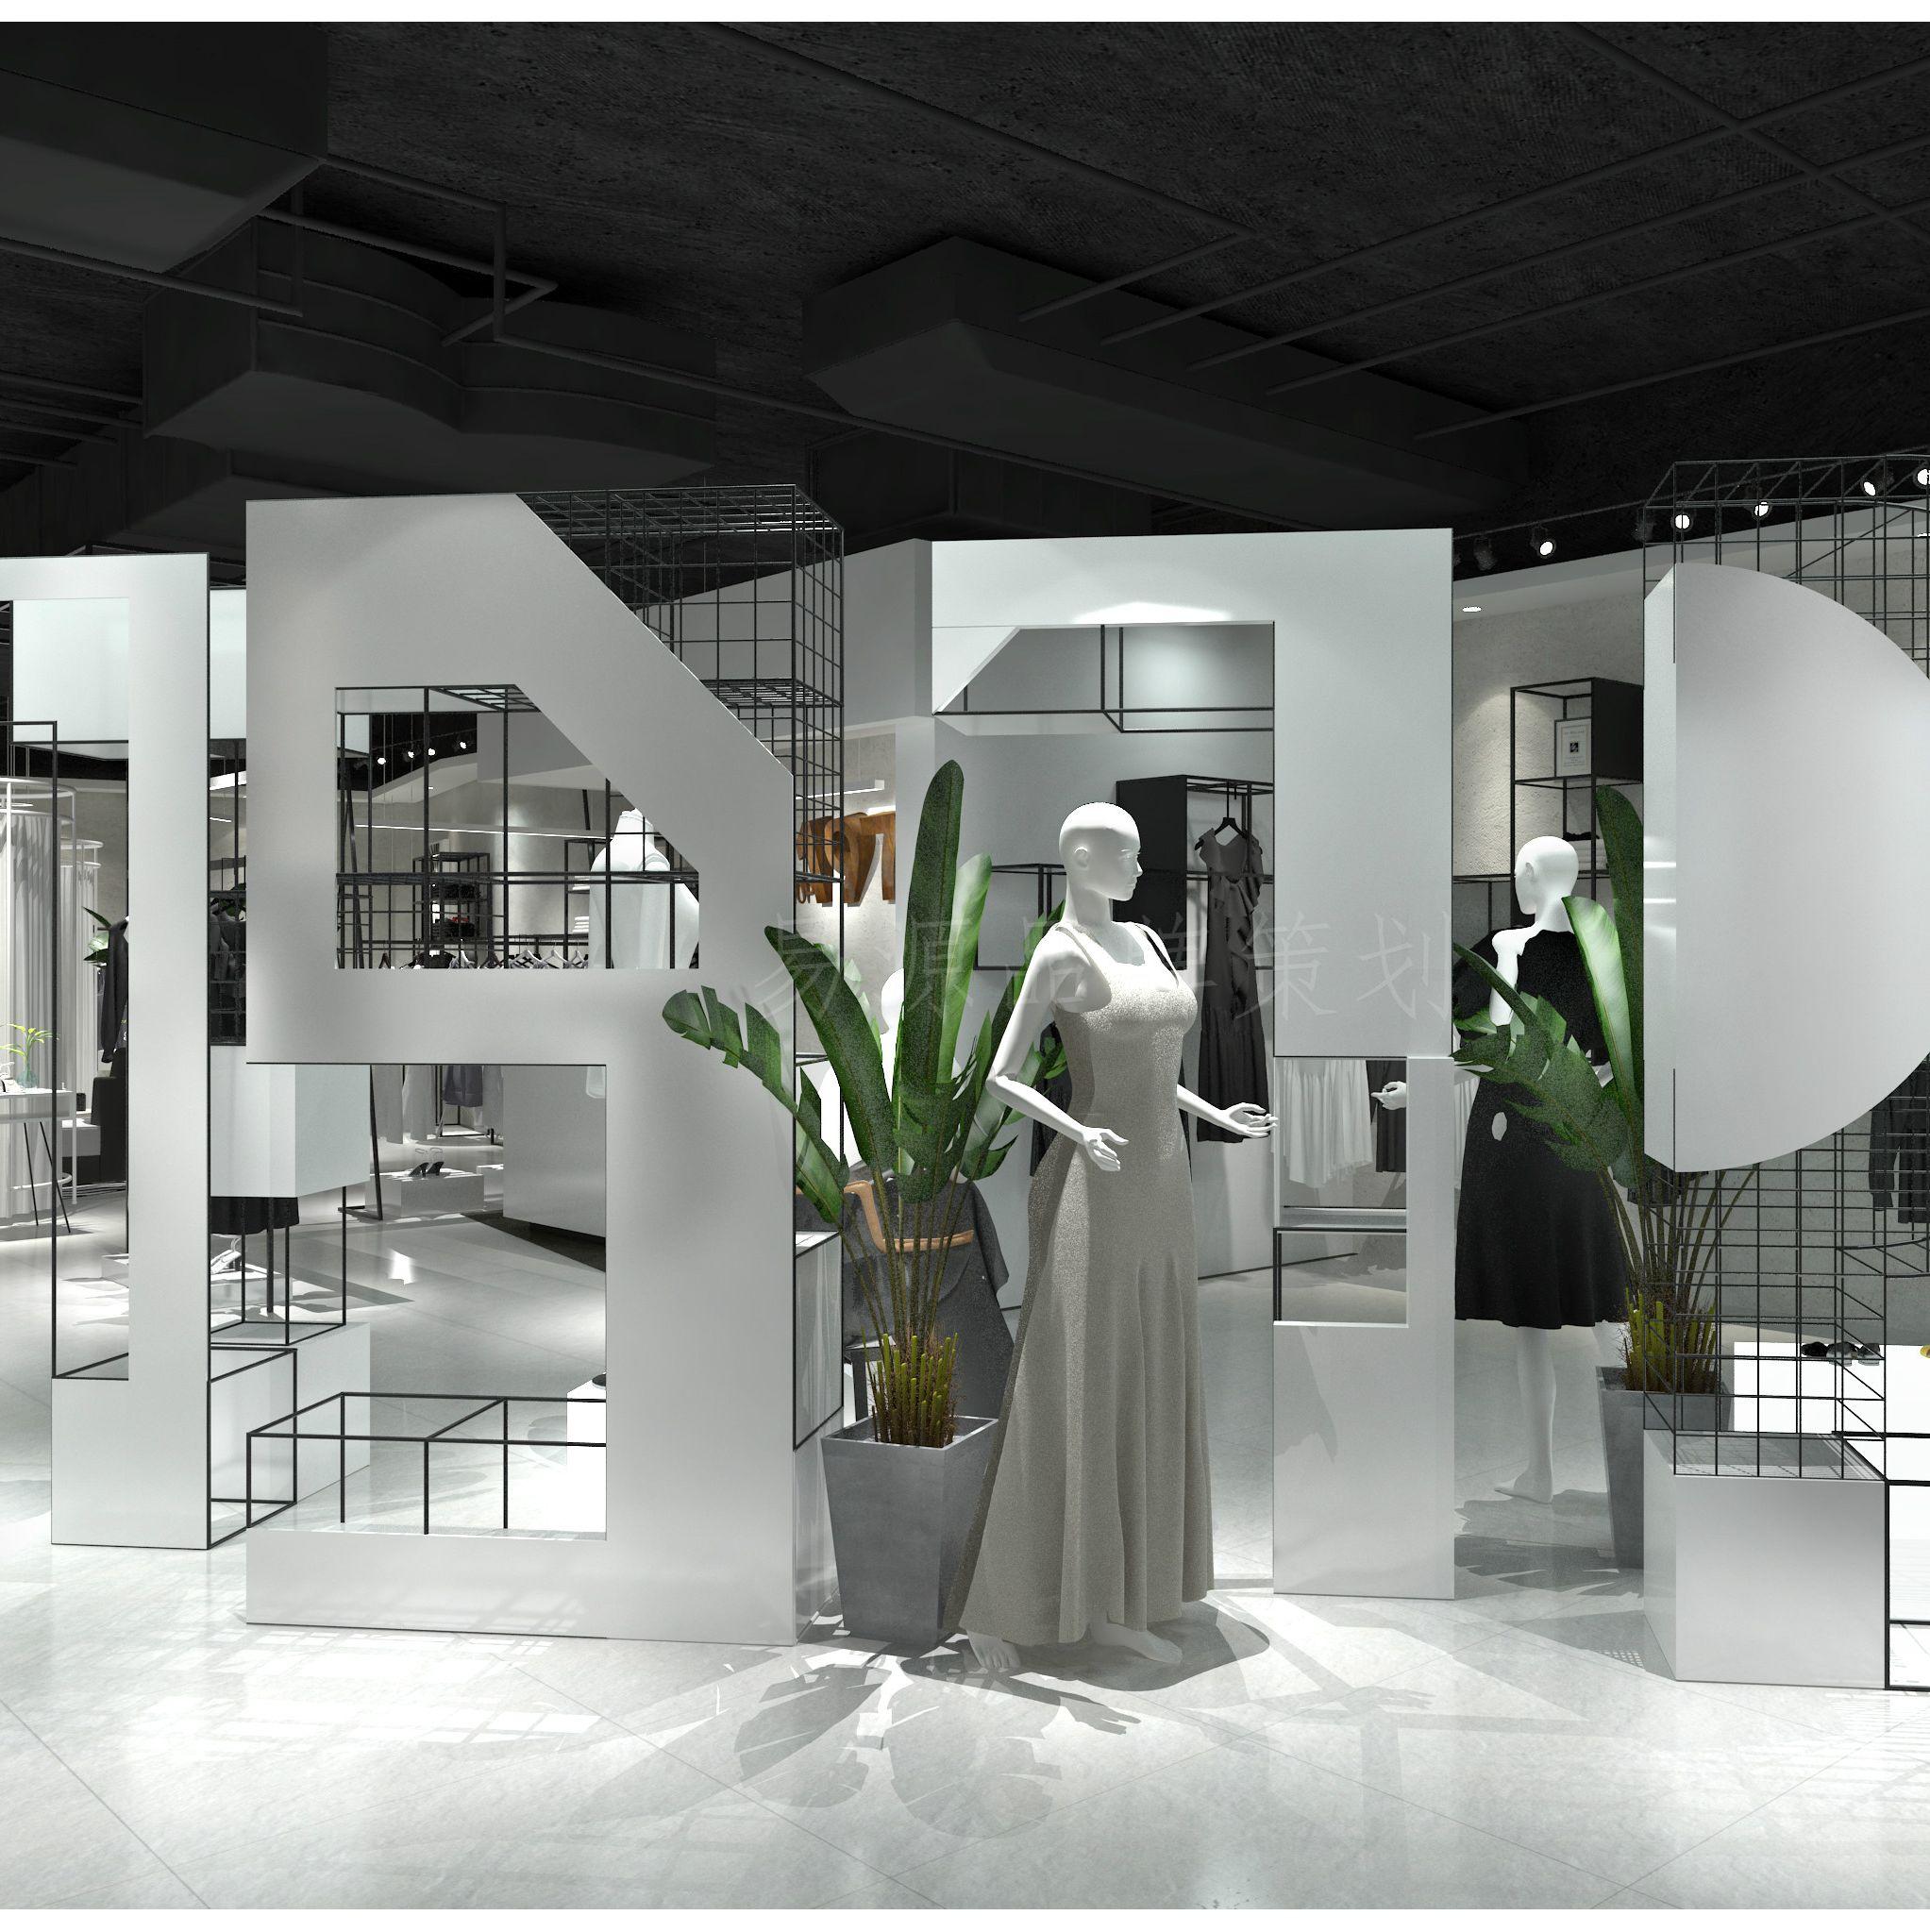 shop 1972女装工装设计|shop 1972工装设计